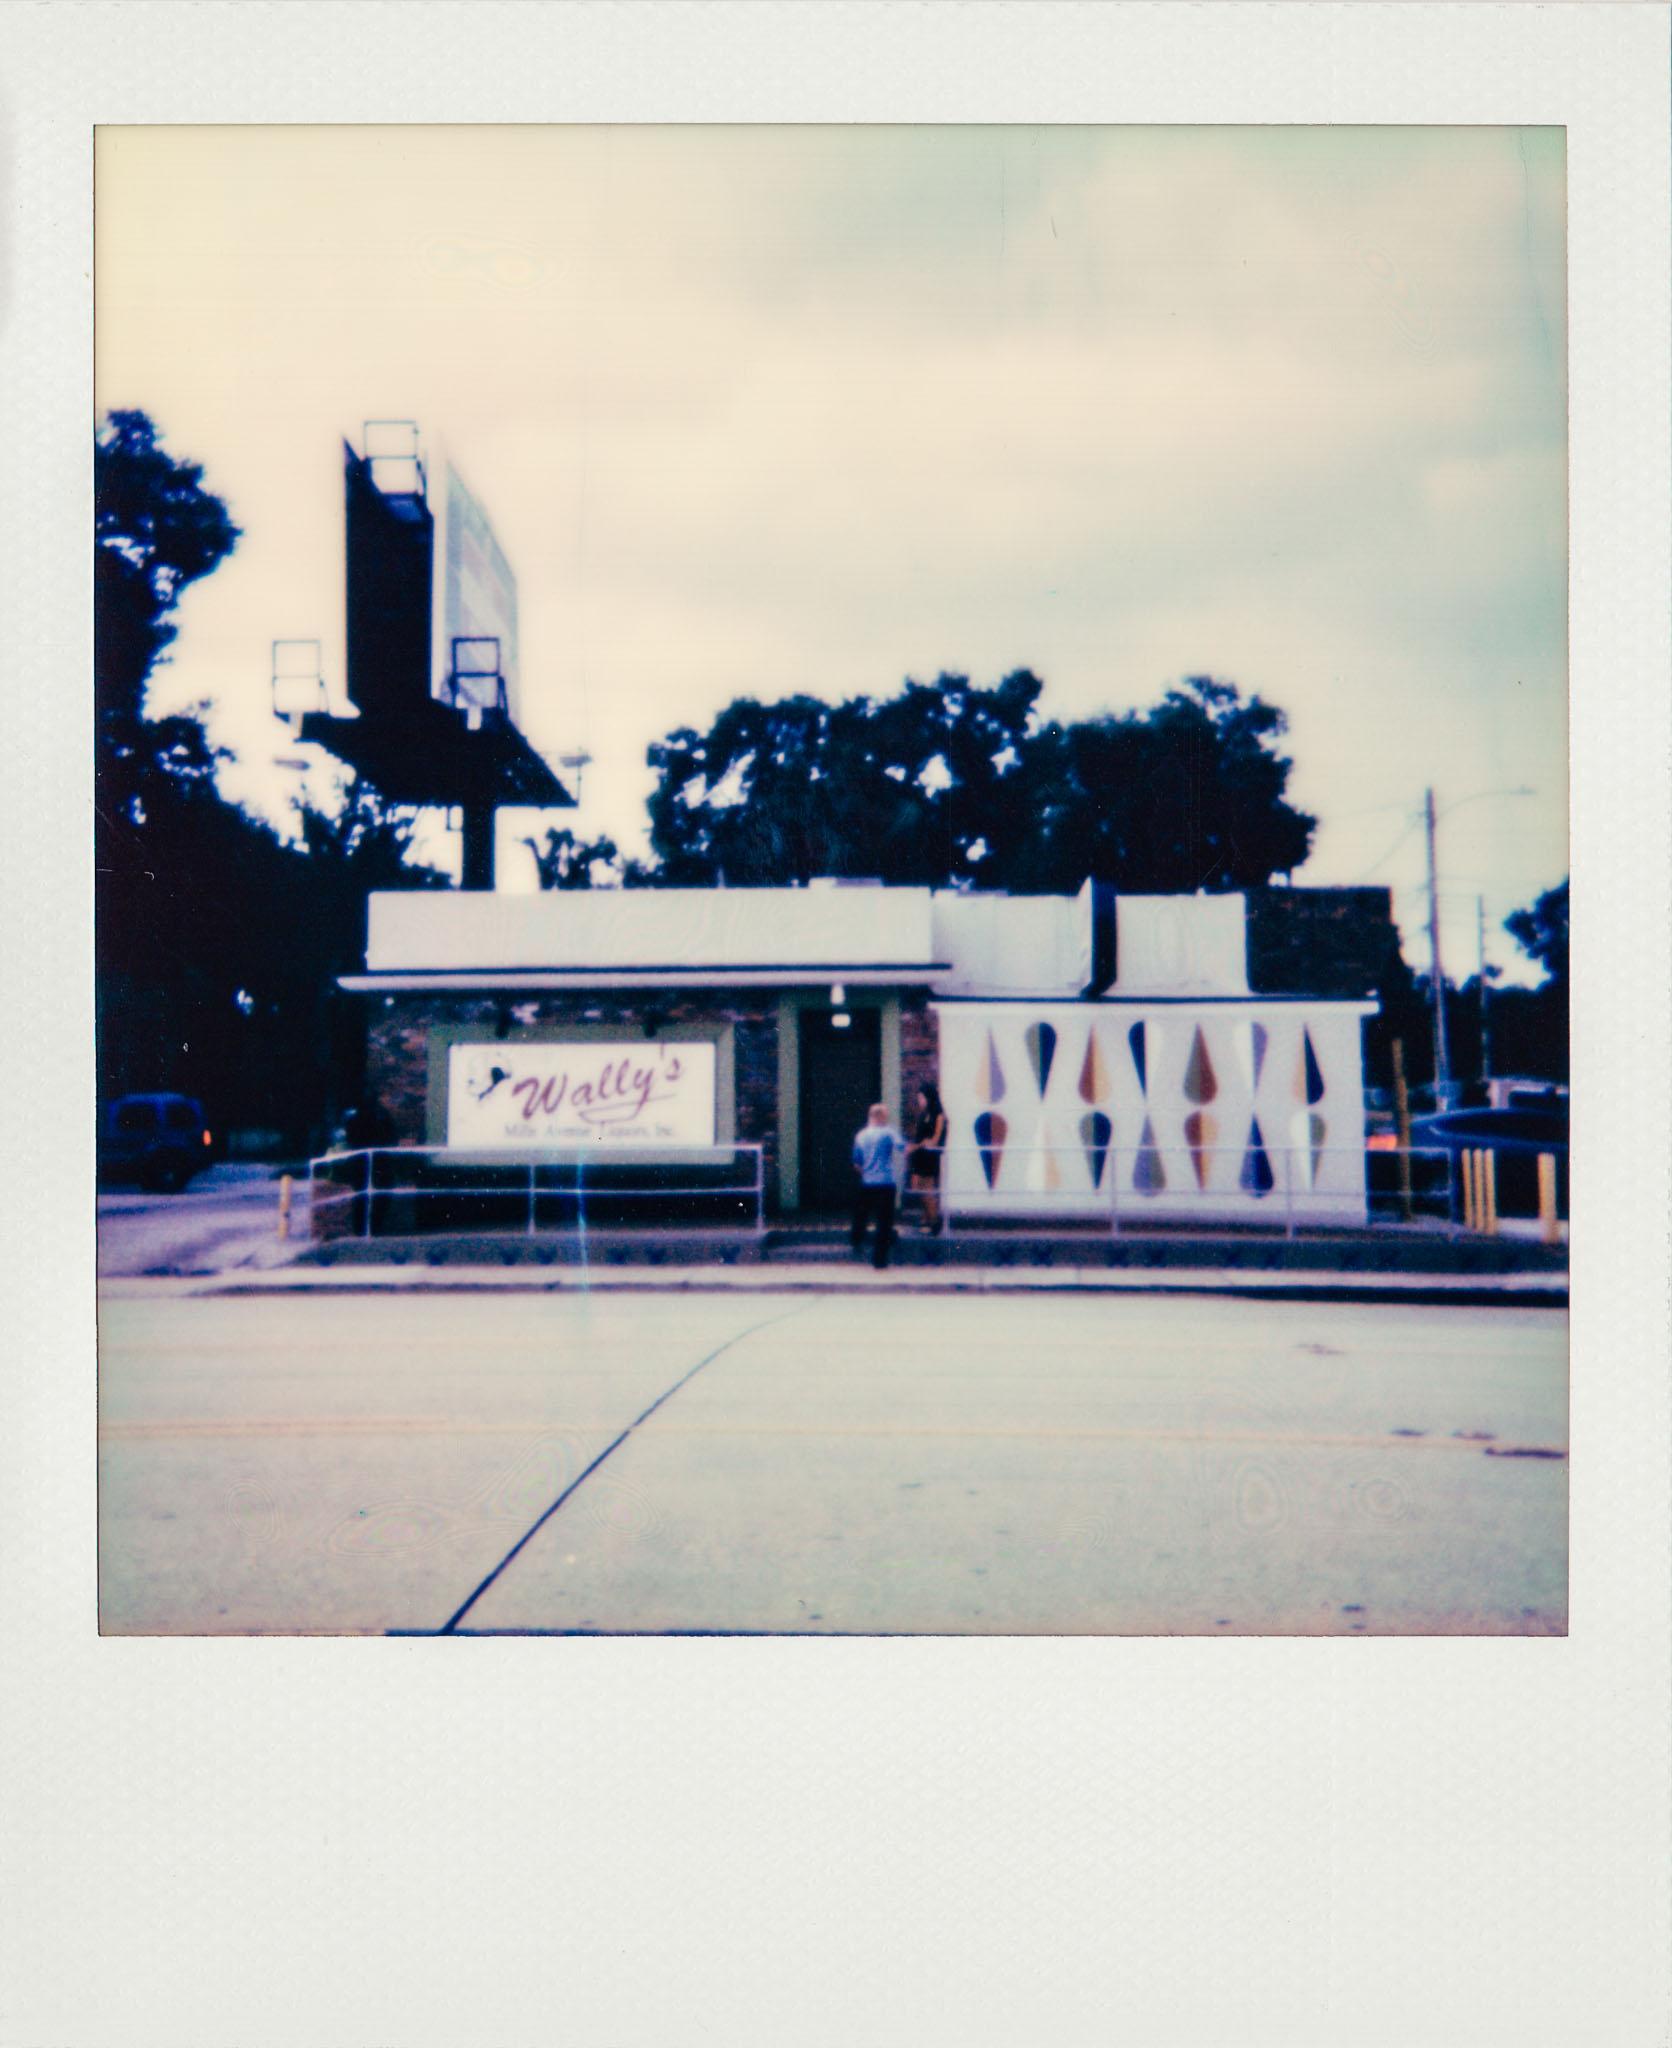 Wallys-mills-liquors-polaroid.jpg